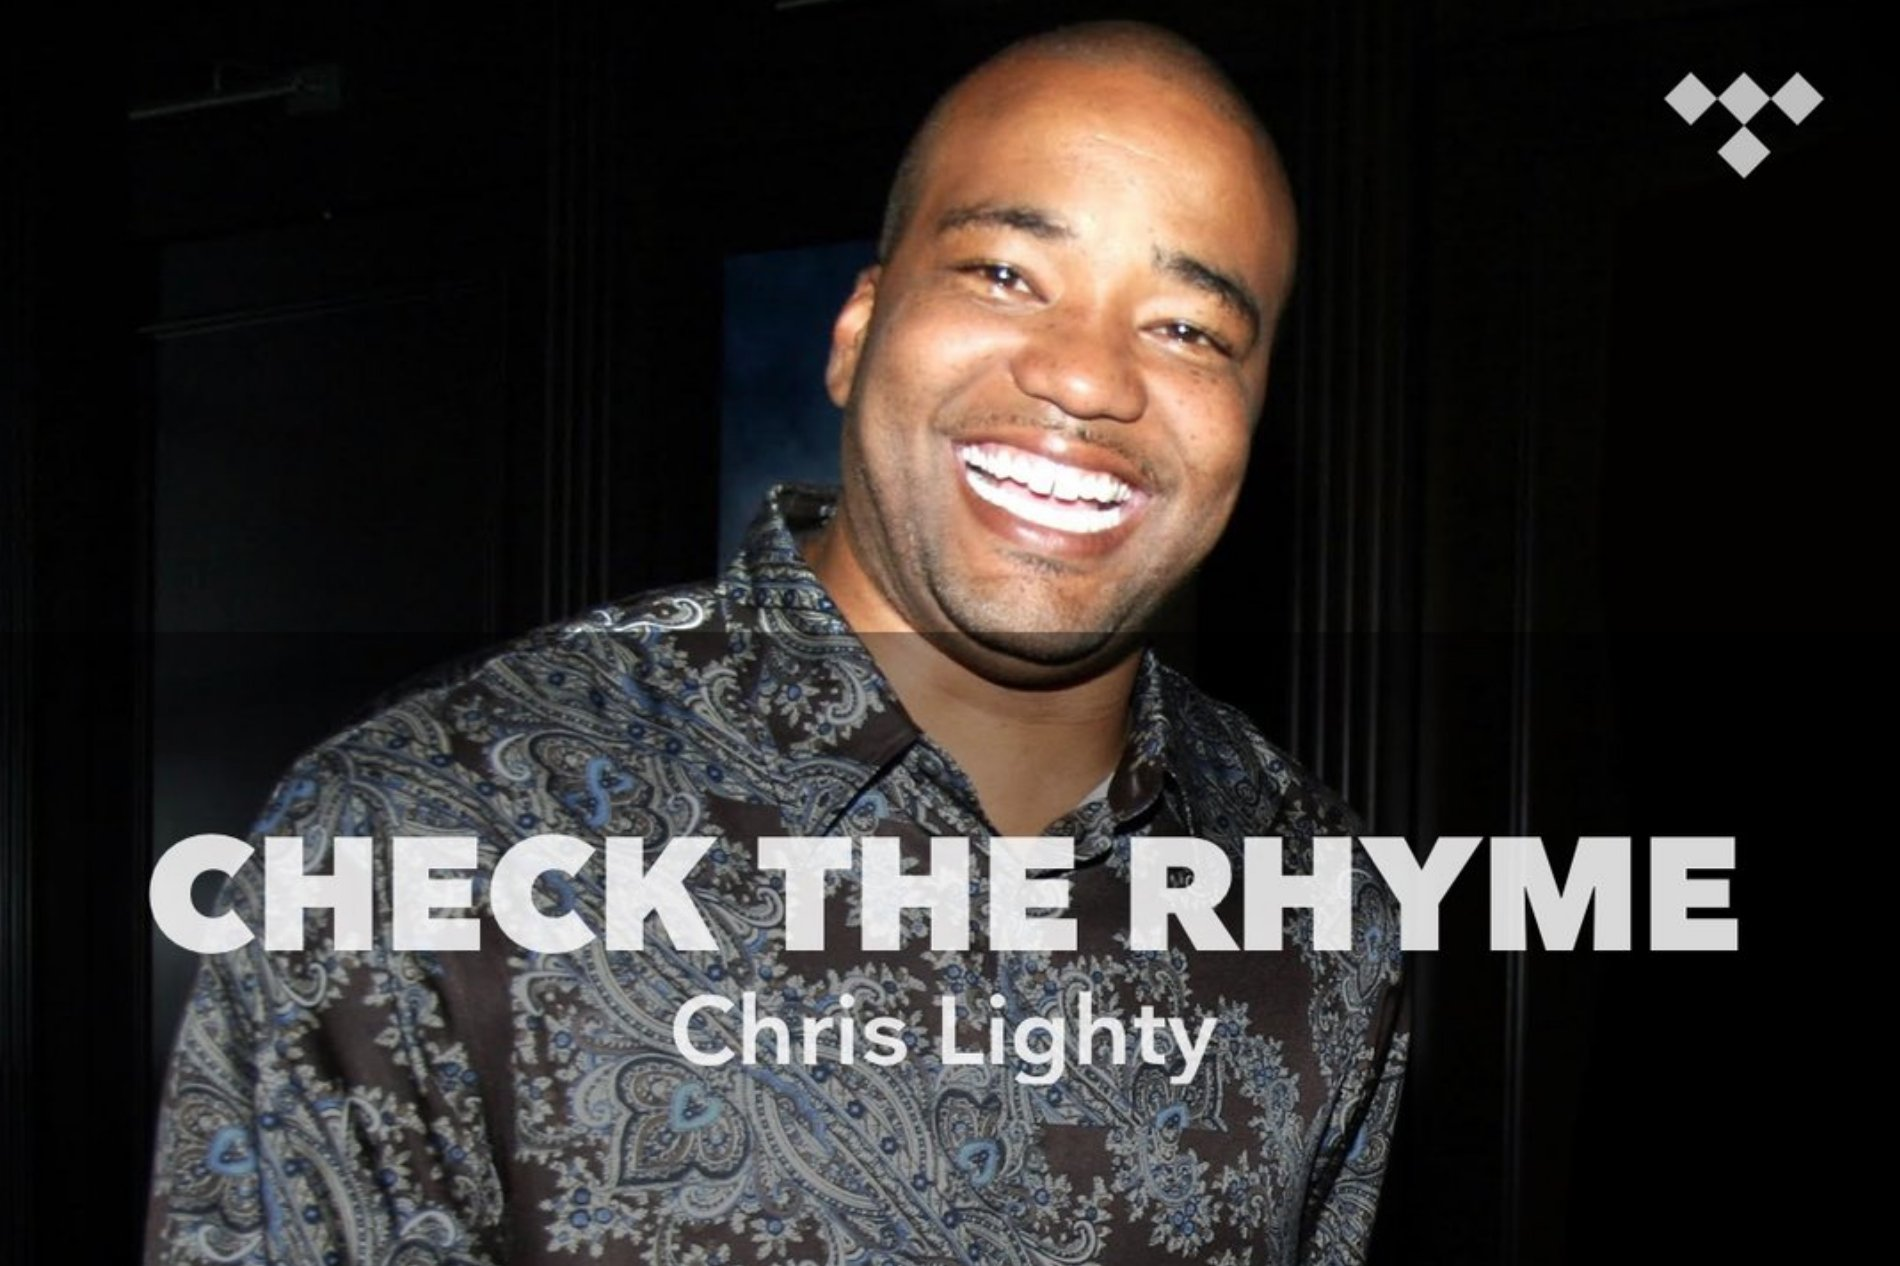 Check The Rhyme: Chris Lighty https://t.co/FfPTbi7GXT #TIDAL https://t.co/qmRL7XlG1t